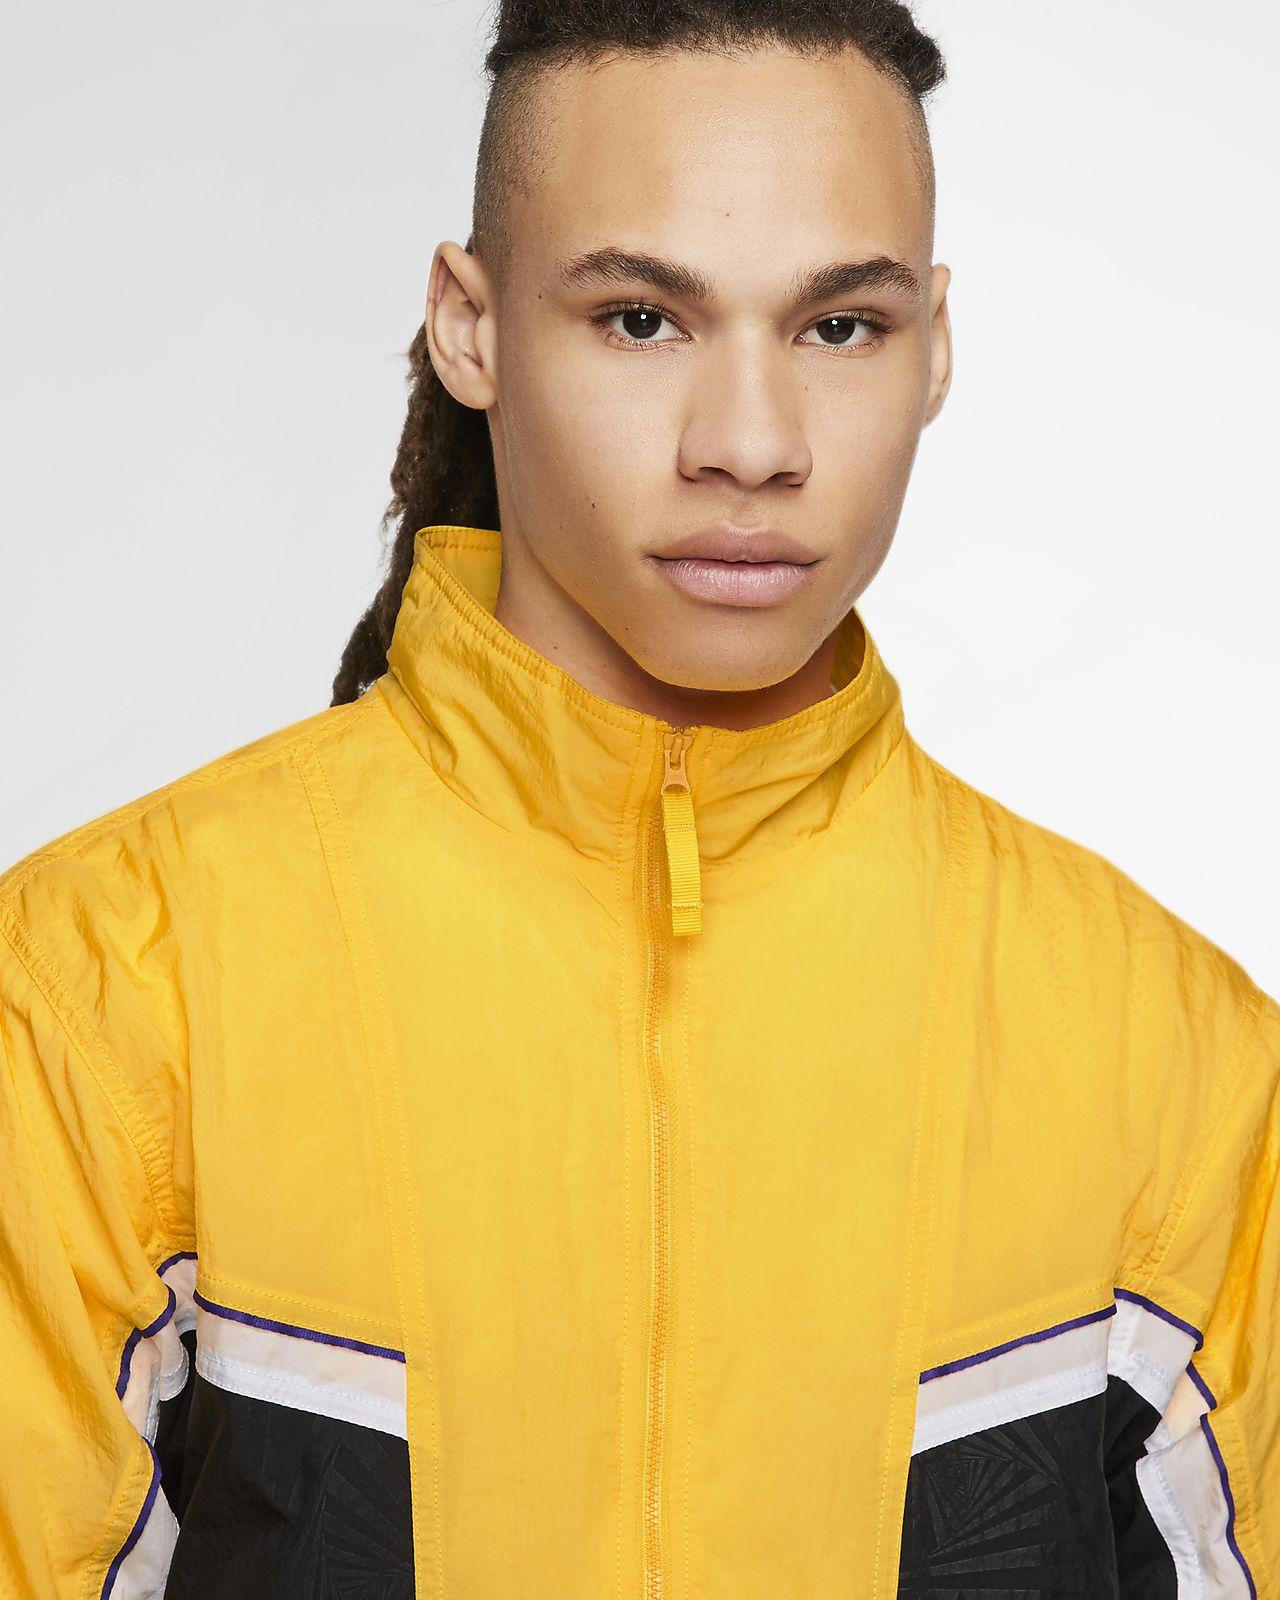 Lakers City Edition DNA Men's Nike NBA Jacket